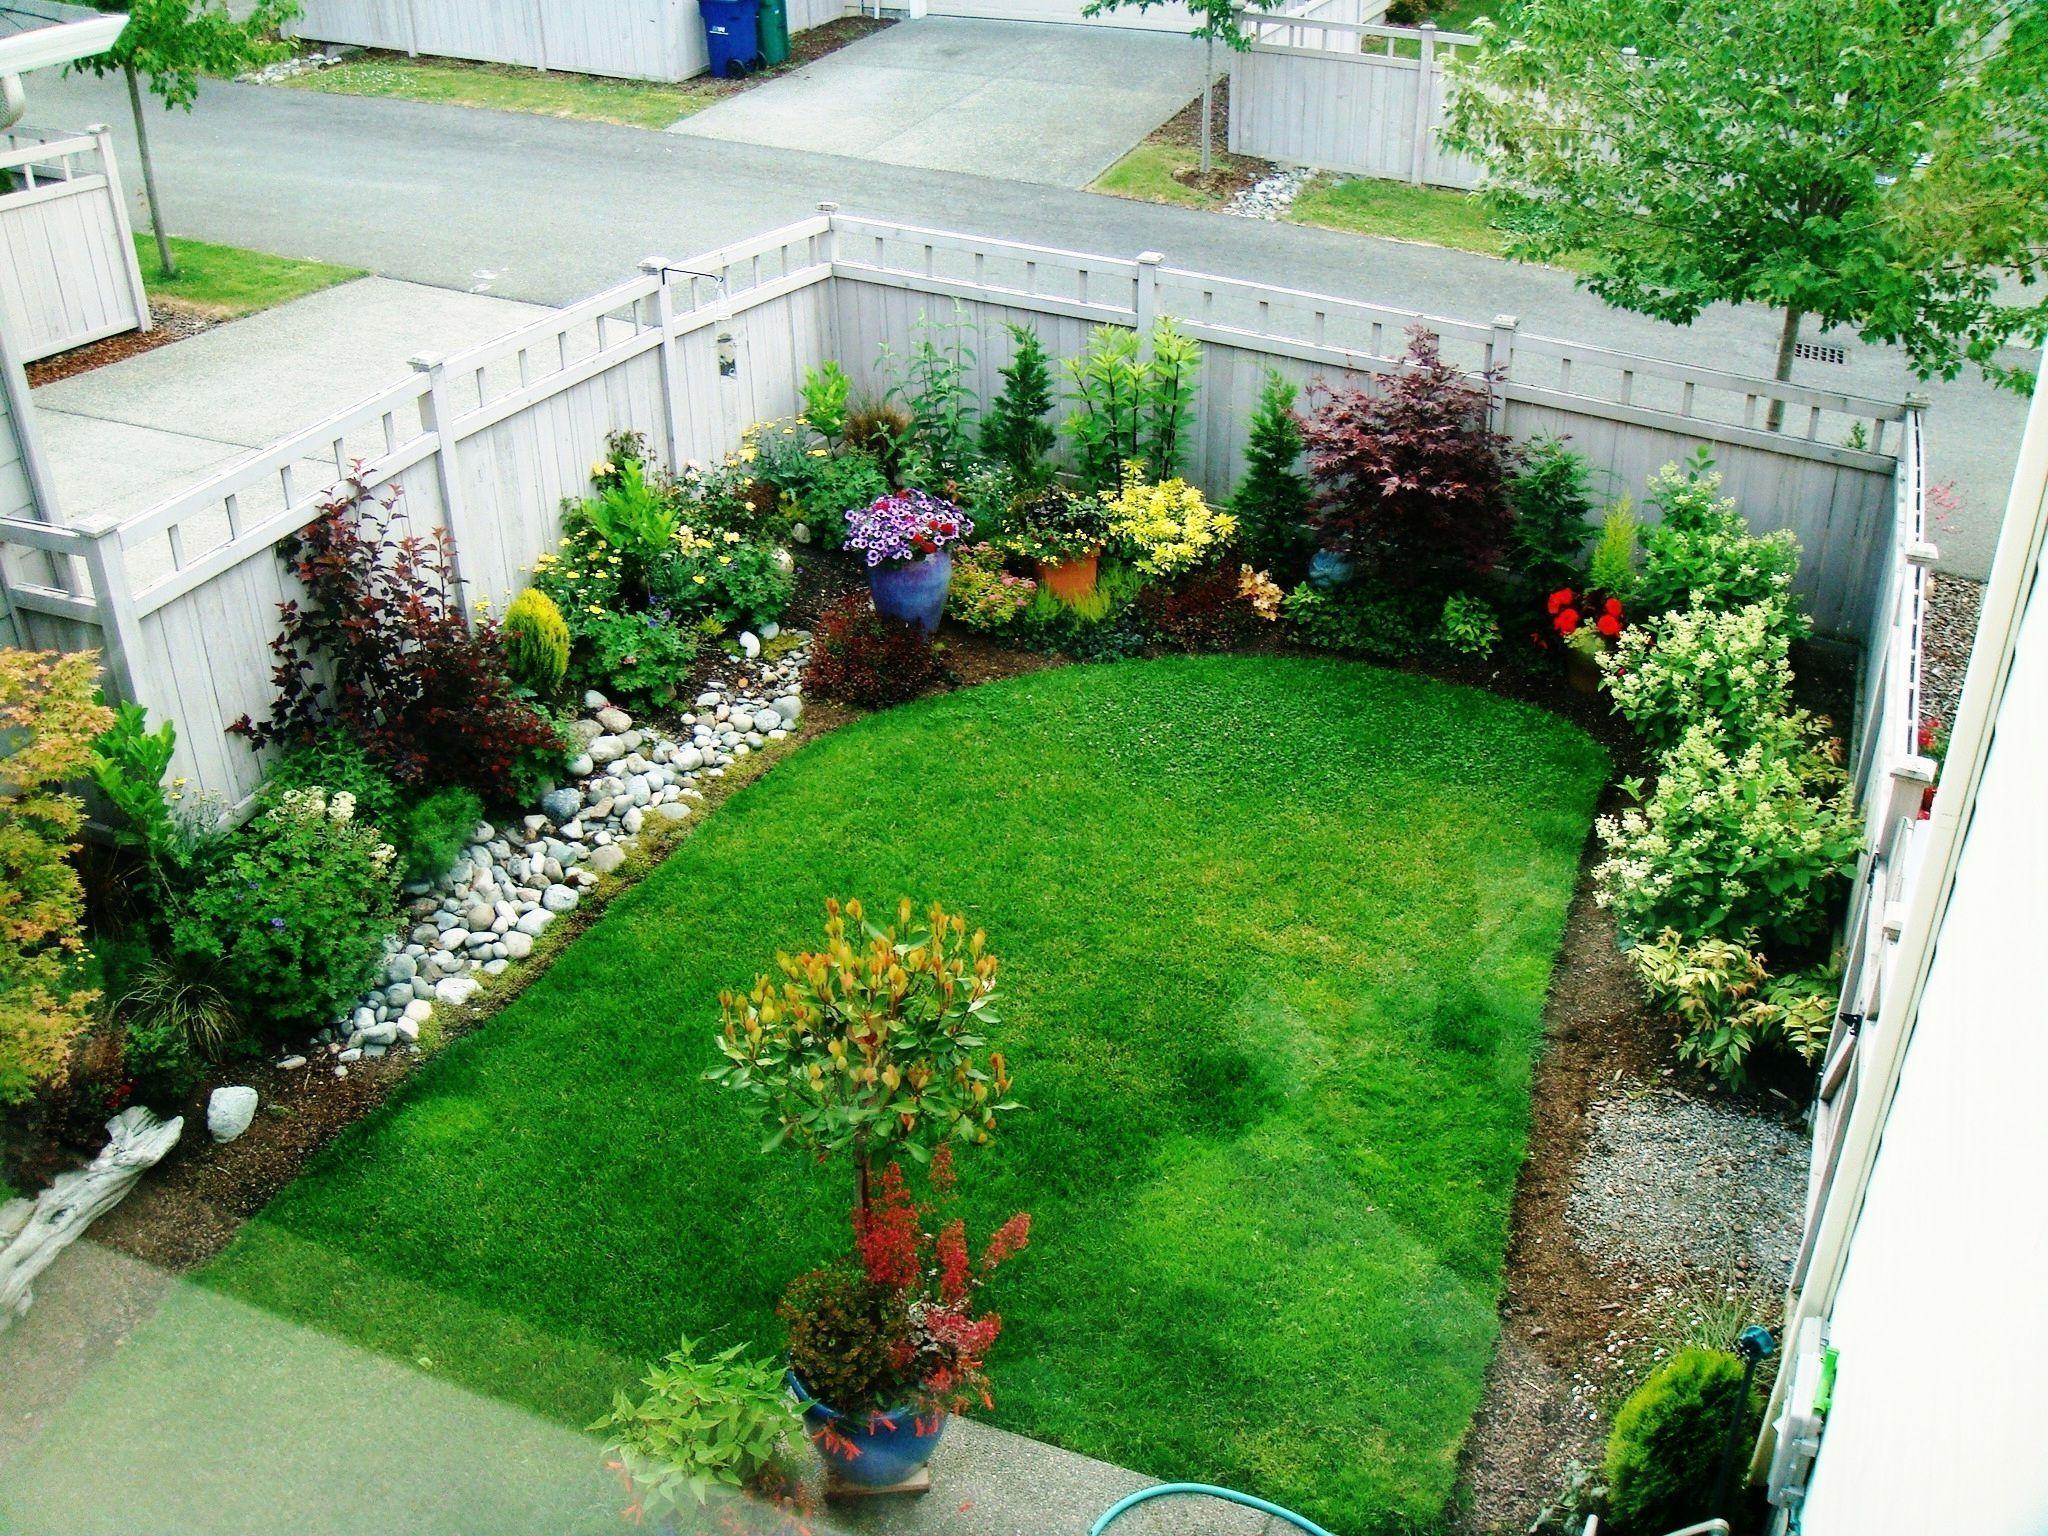 58 Beautiful Backyard Garden Ideas For Small Garden Kindofdecor Com Small Garden Landscape Small Yard Landscaping Front Garden Design